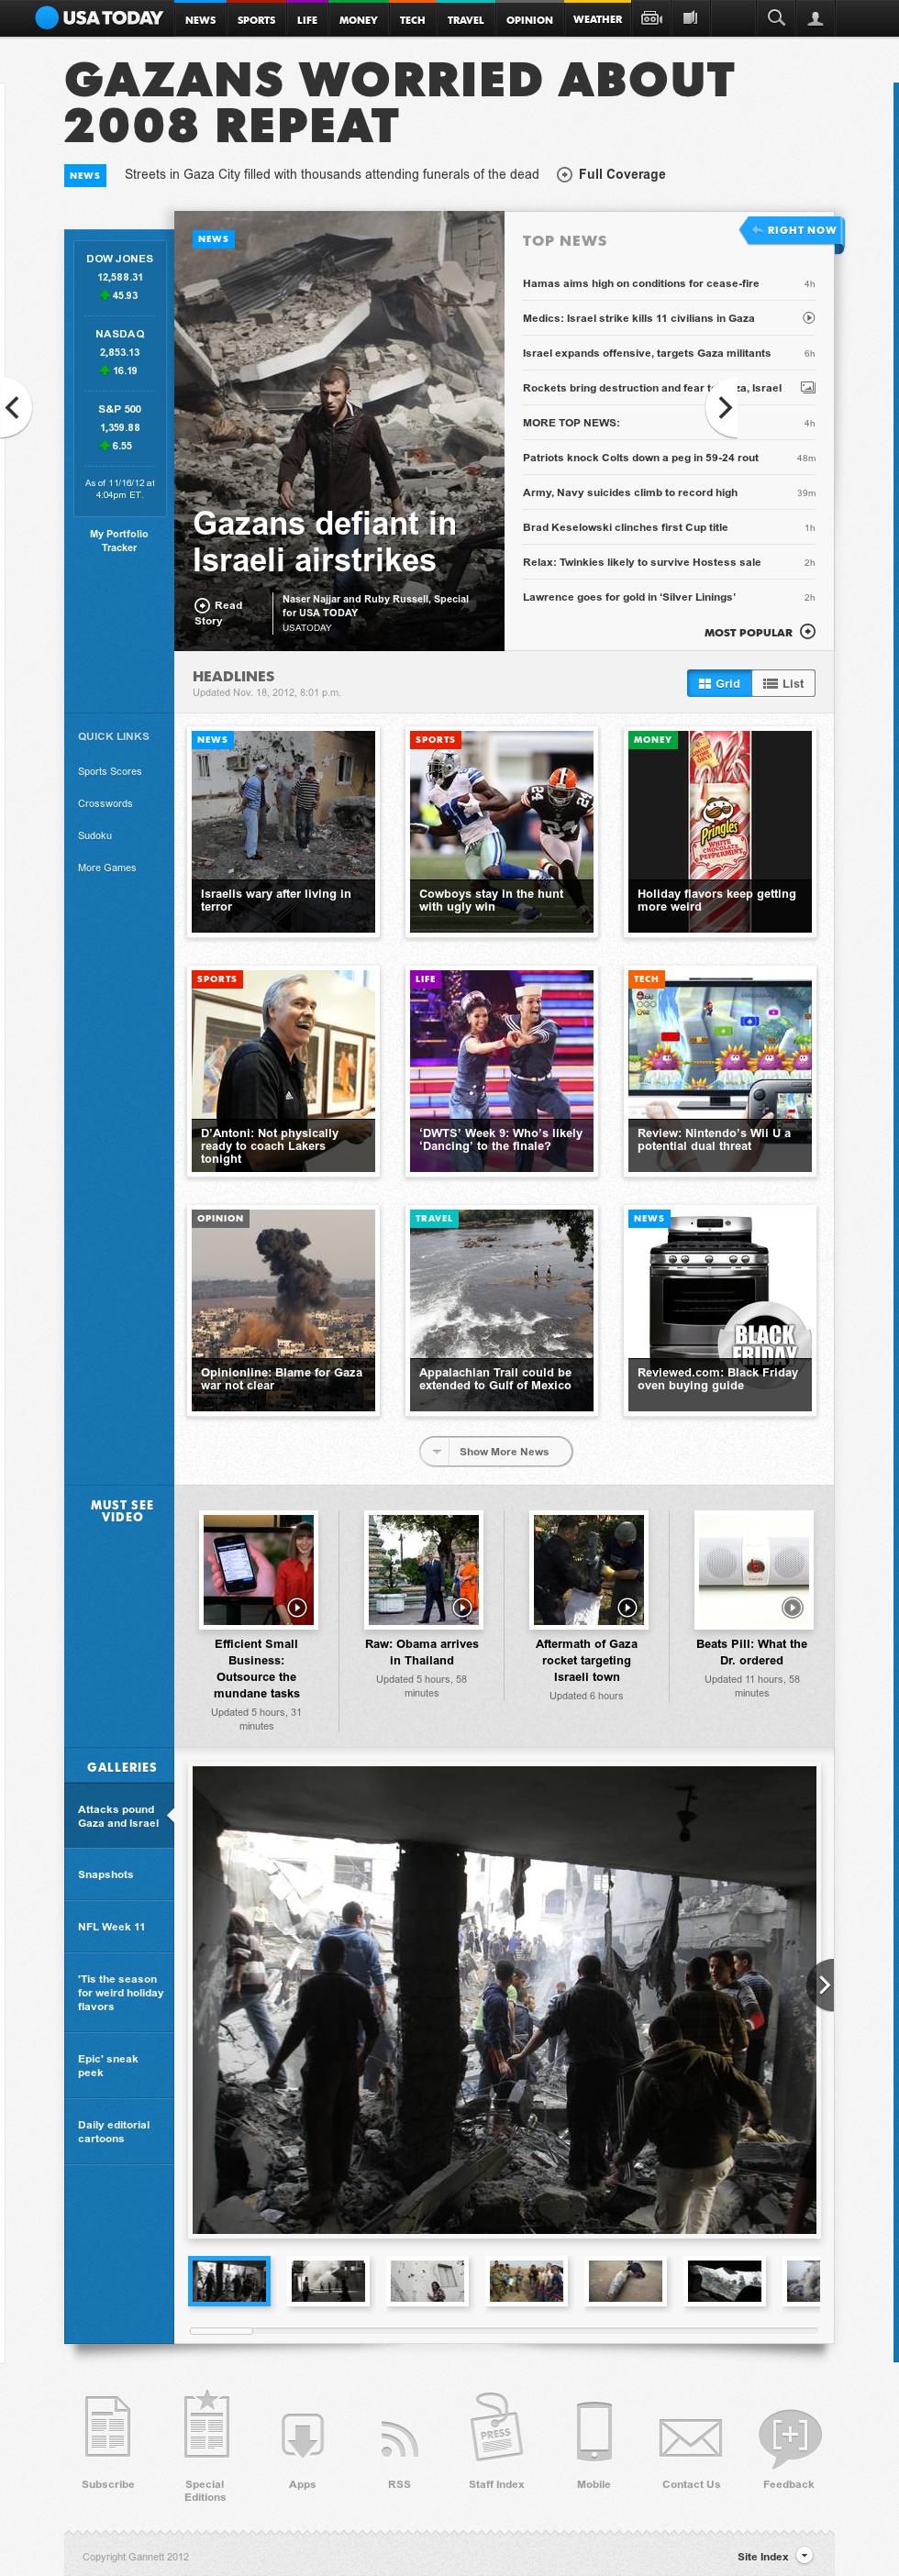 USA Today at Monday Nov. 19, 2012, 1:33 a.m. UTC